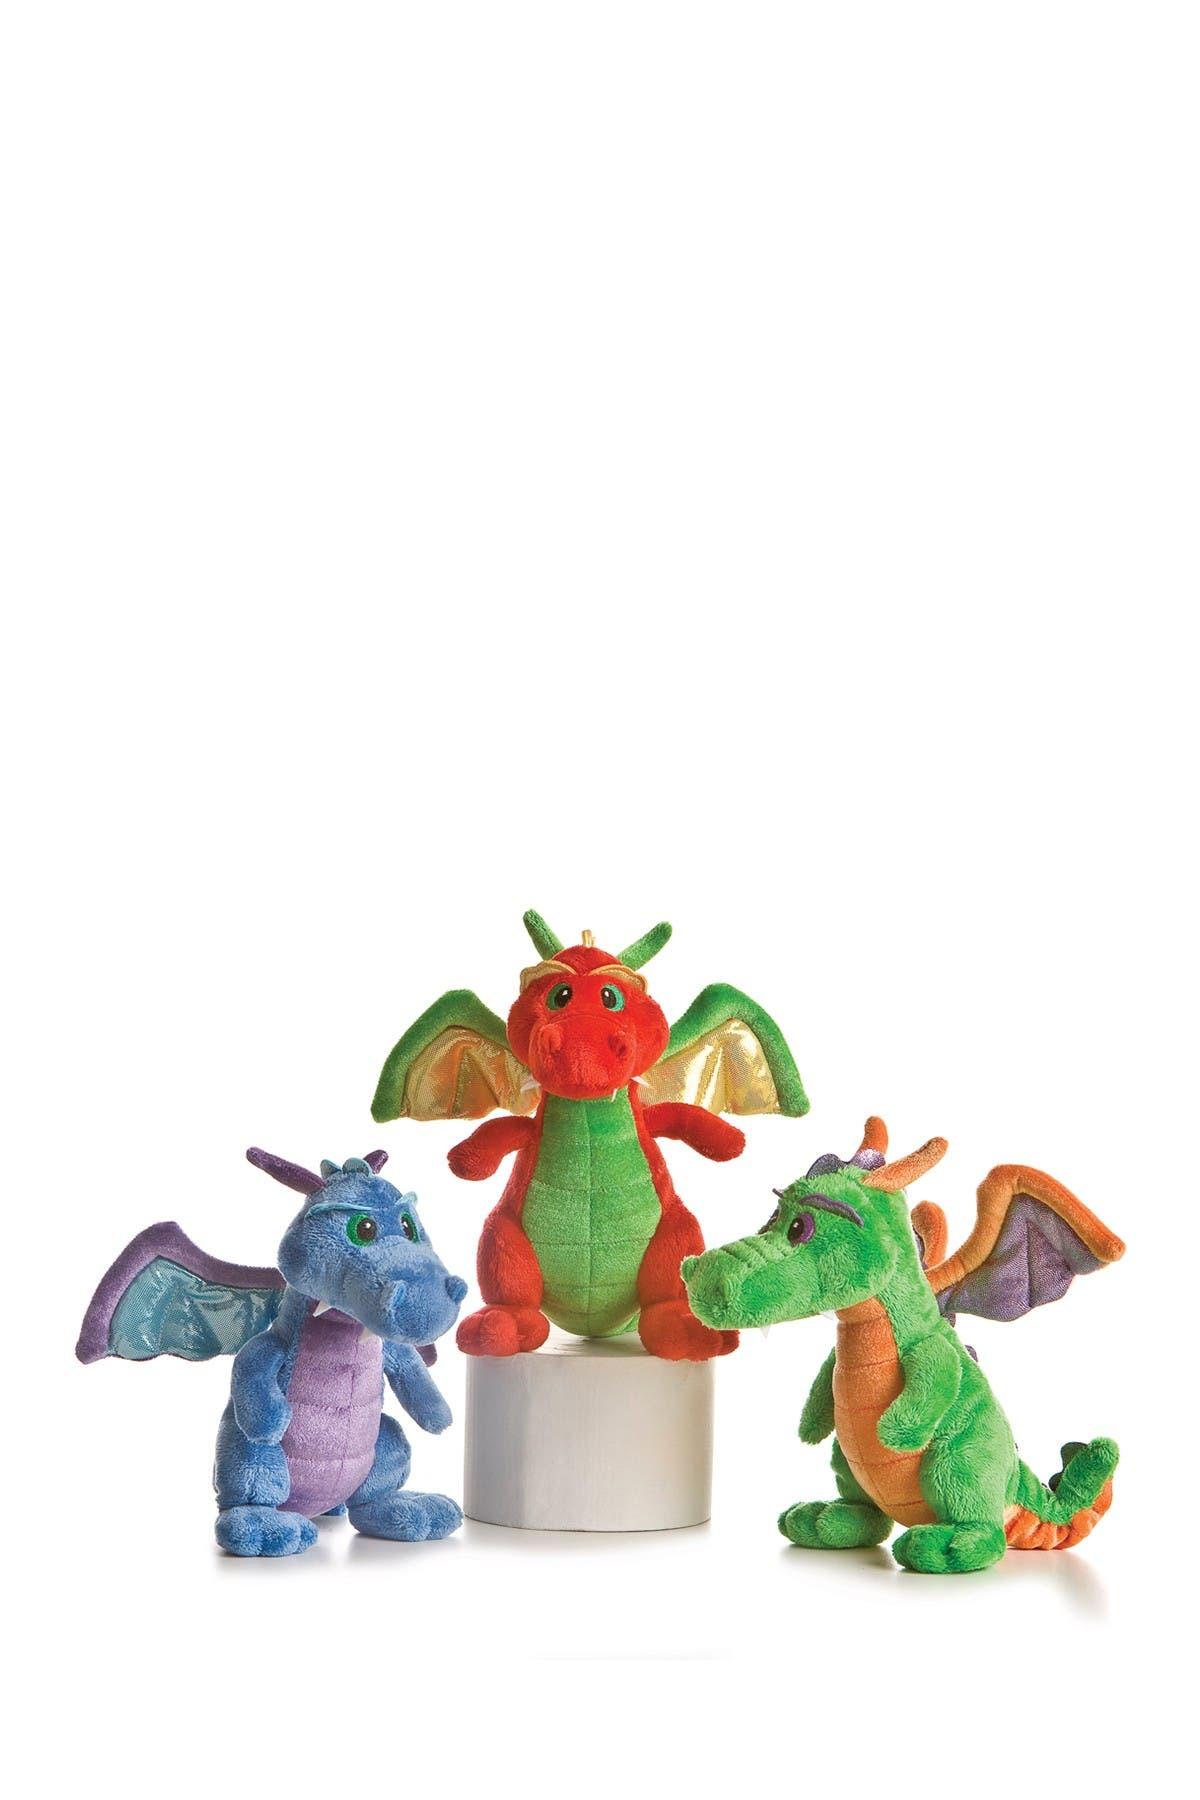 "Image of Aurora World Toys 7"" Legendary Friends Dragon Asst."